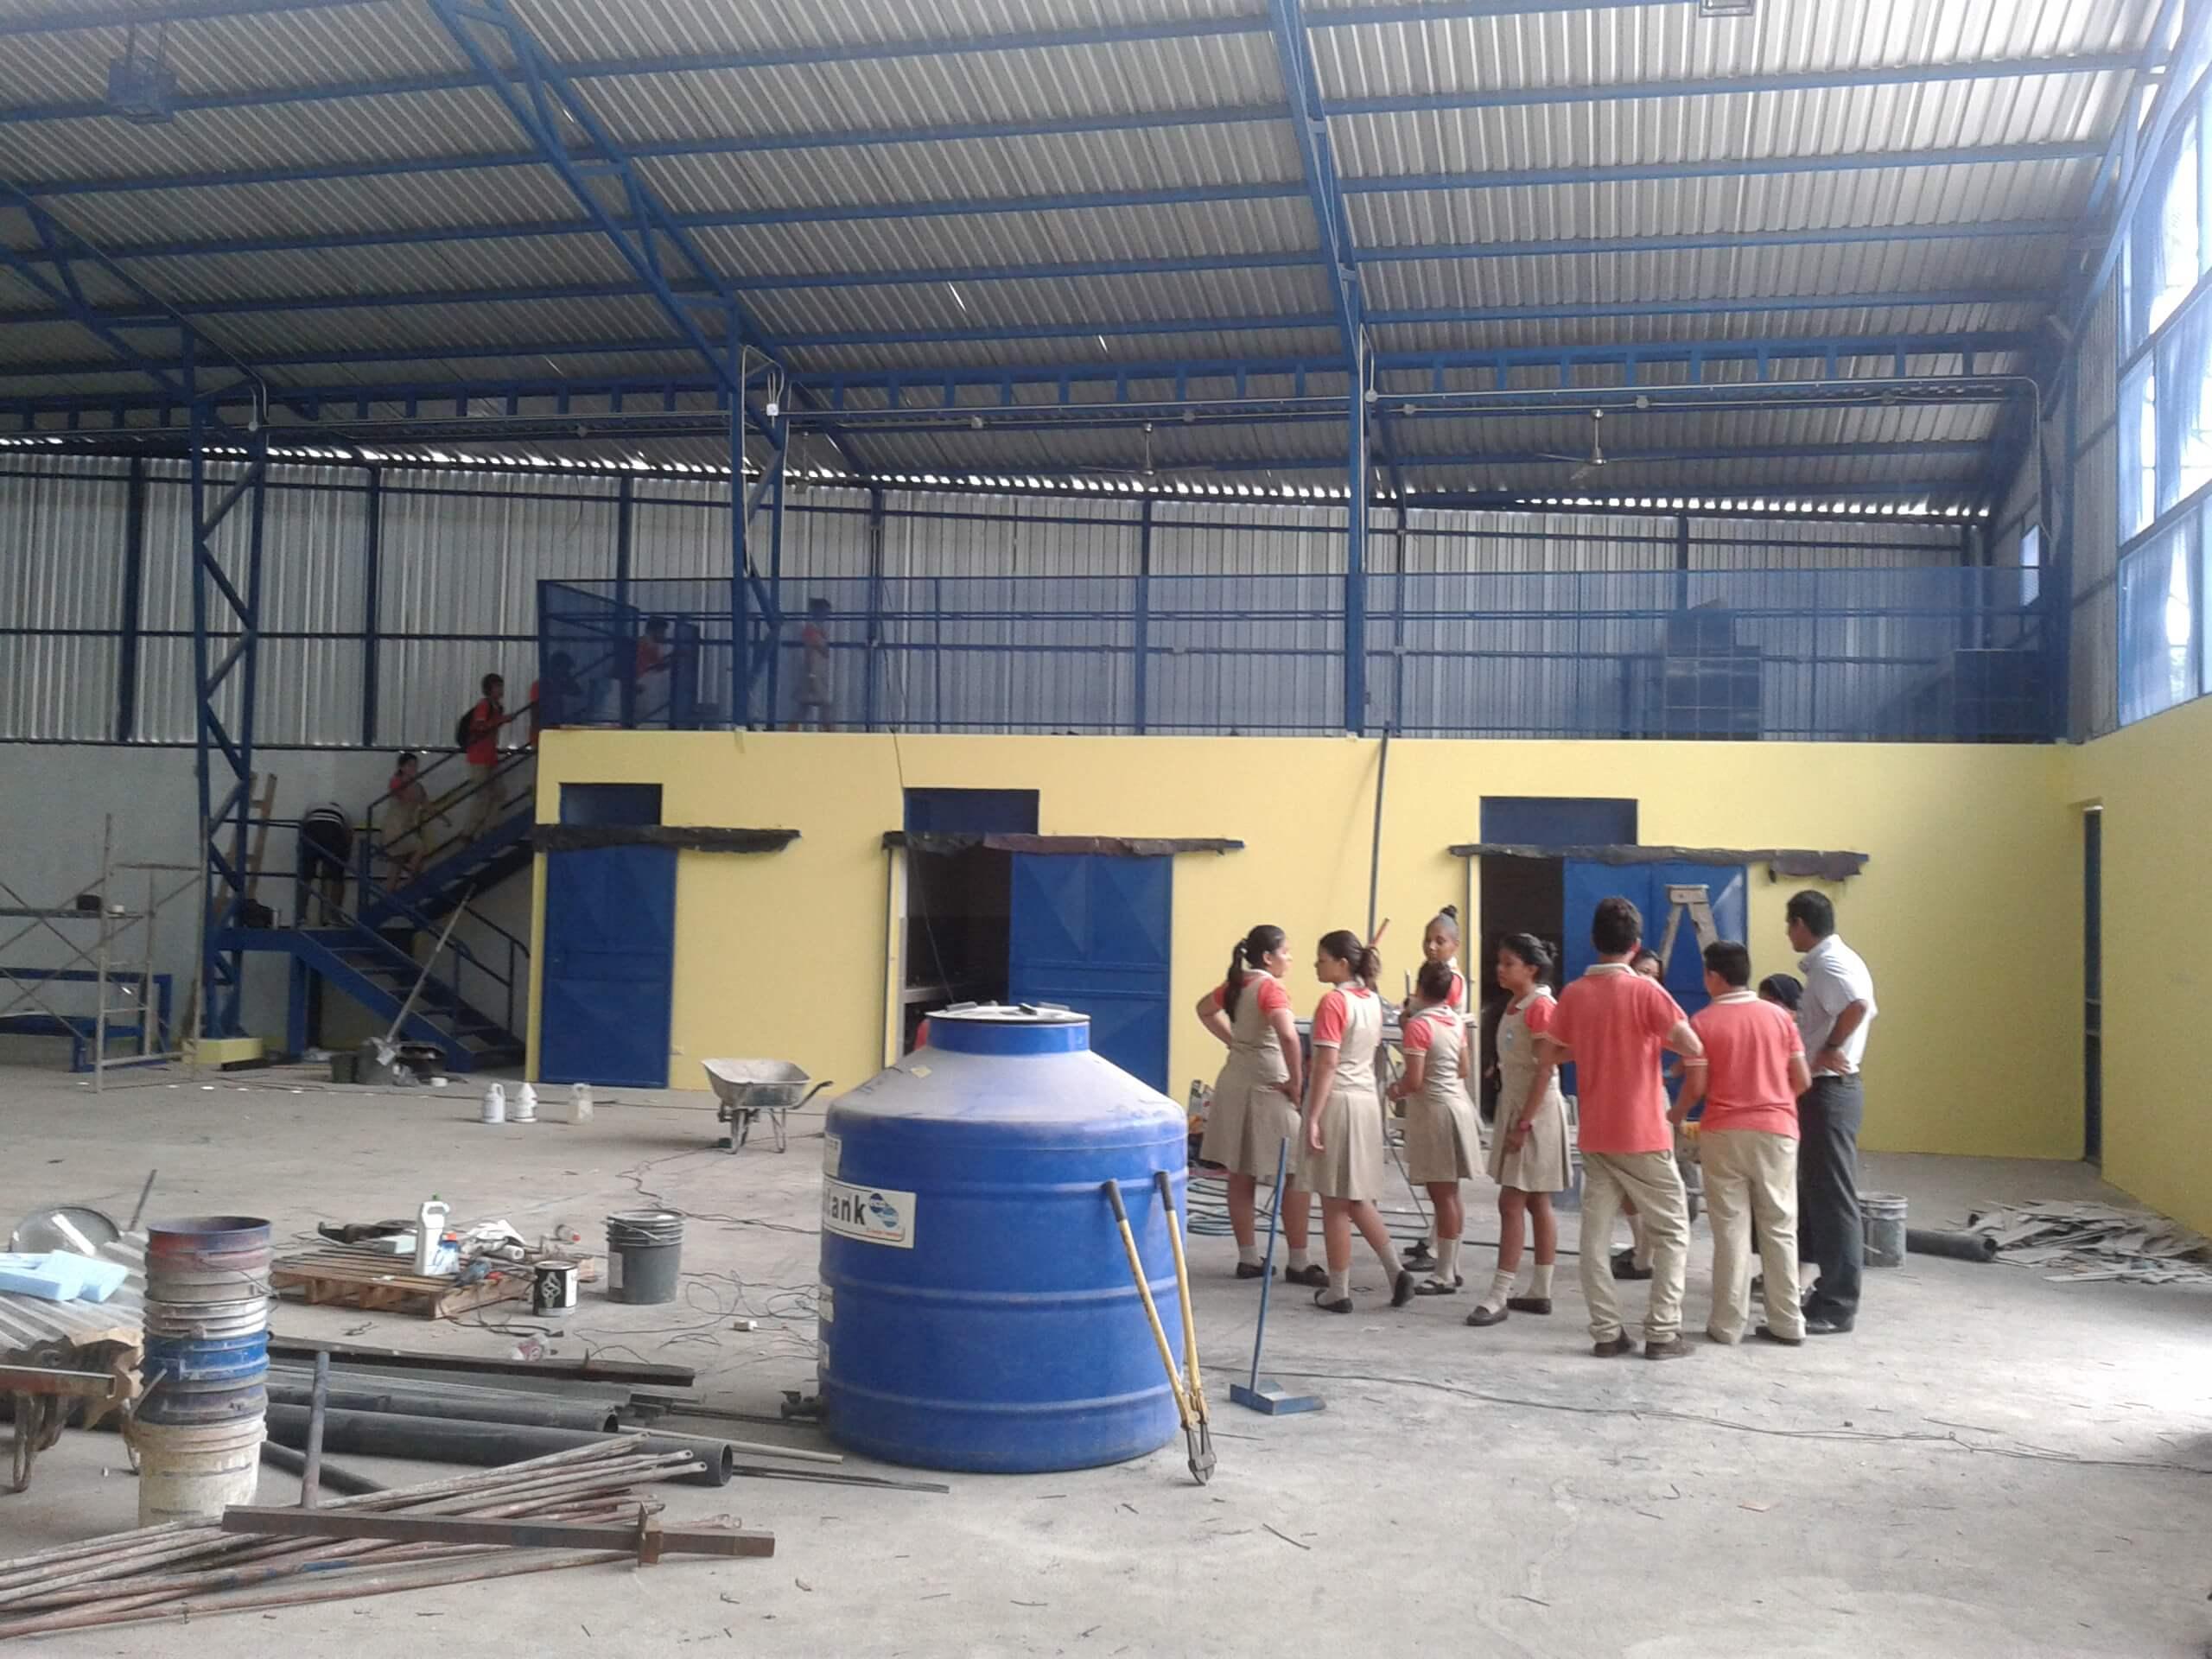 Costa Rica - Construction Progress on school gymnasium